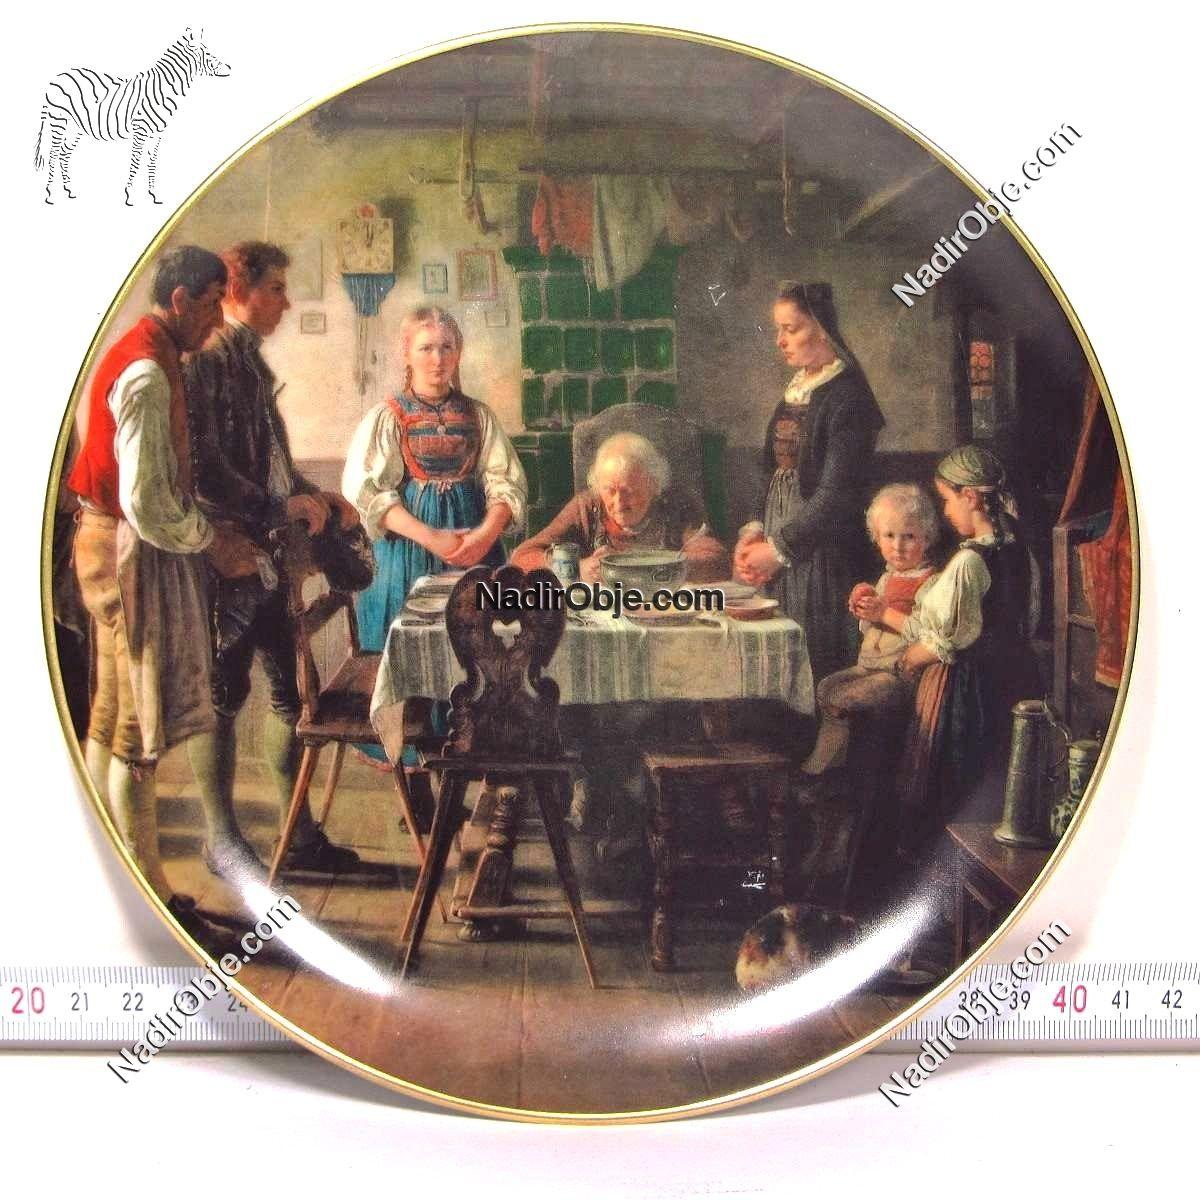 Resimli Porselen Tabak Seramik-Porselen Objeler Alman